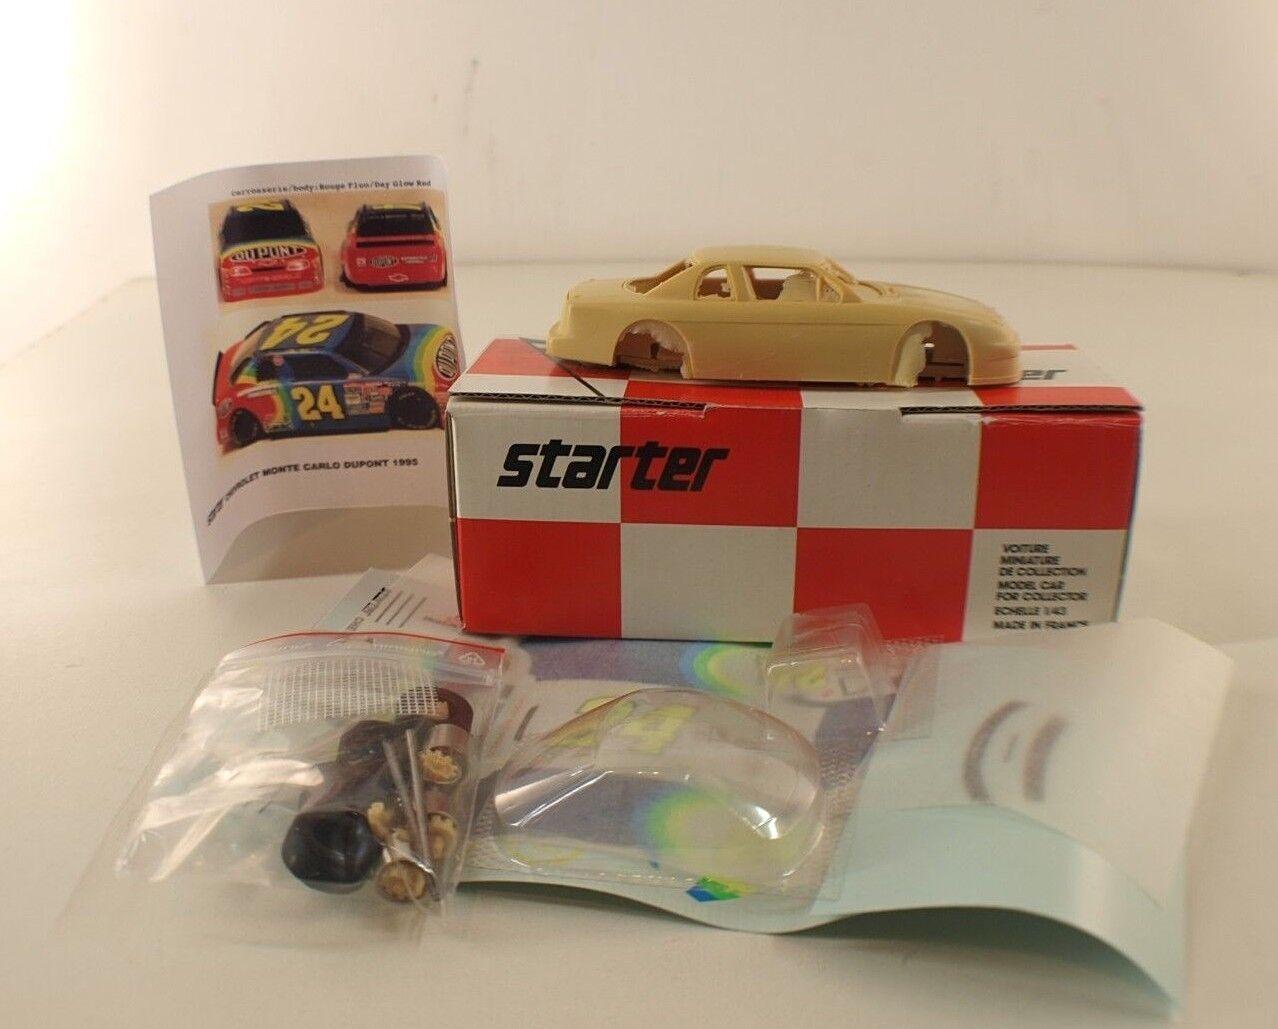 Starter CHE053 Chevrolet Monte Carlo Dupont Monte Carlo 1995 kit neuf mint 1 43